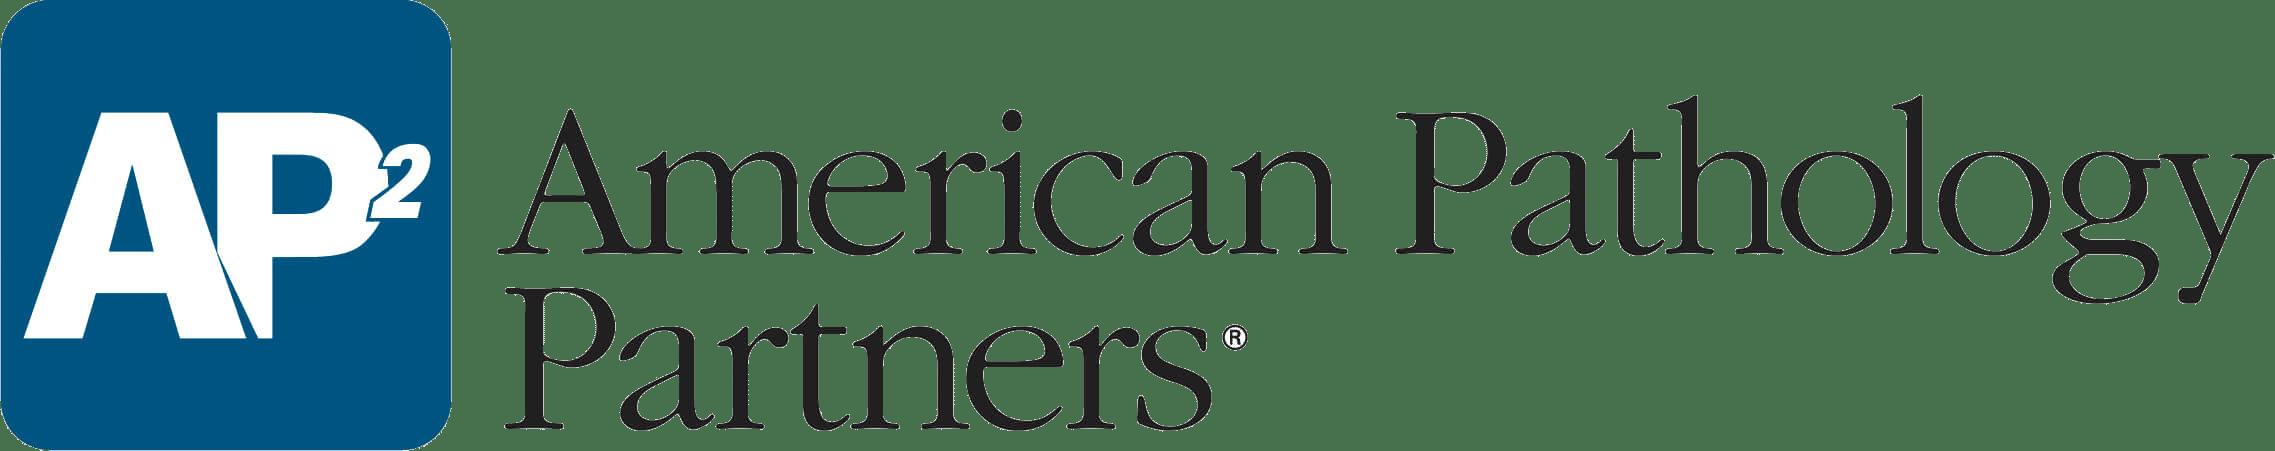 American Pathology Partners